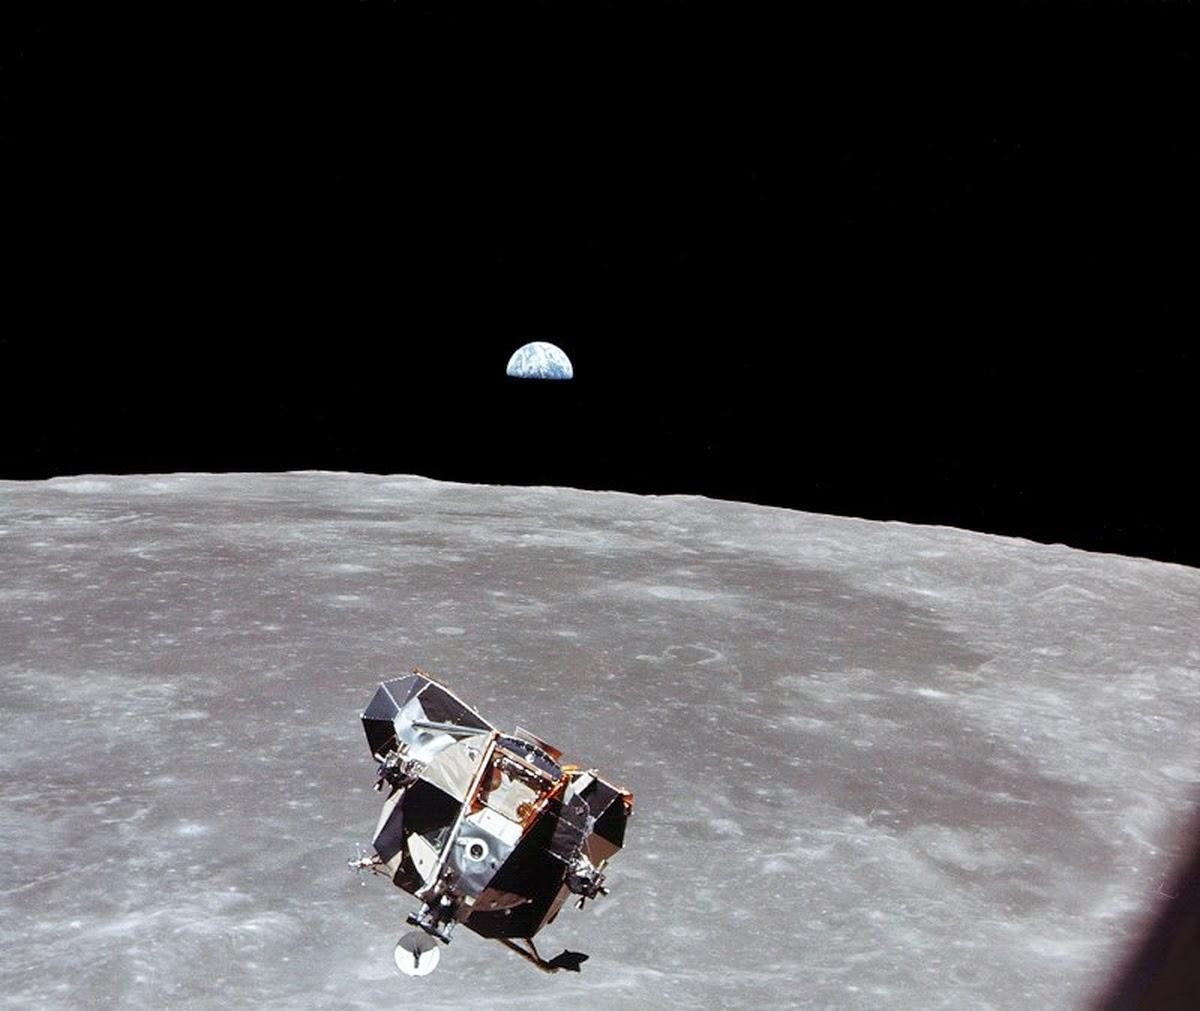 apollo 11 moon landing mystery - photo #13